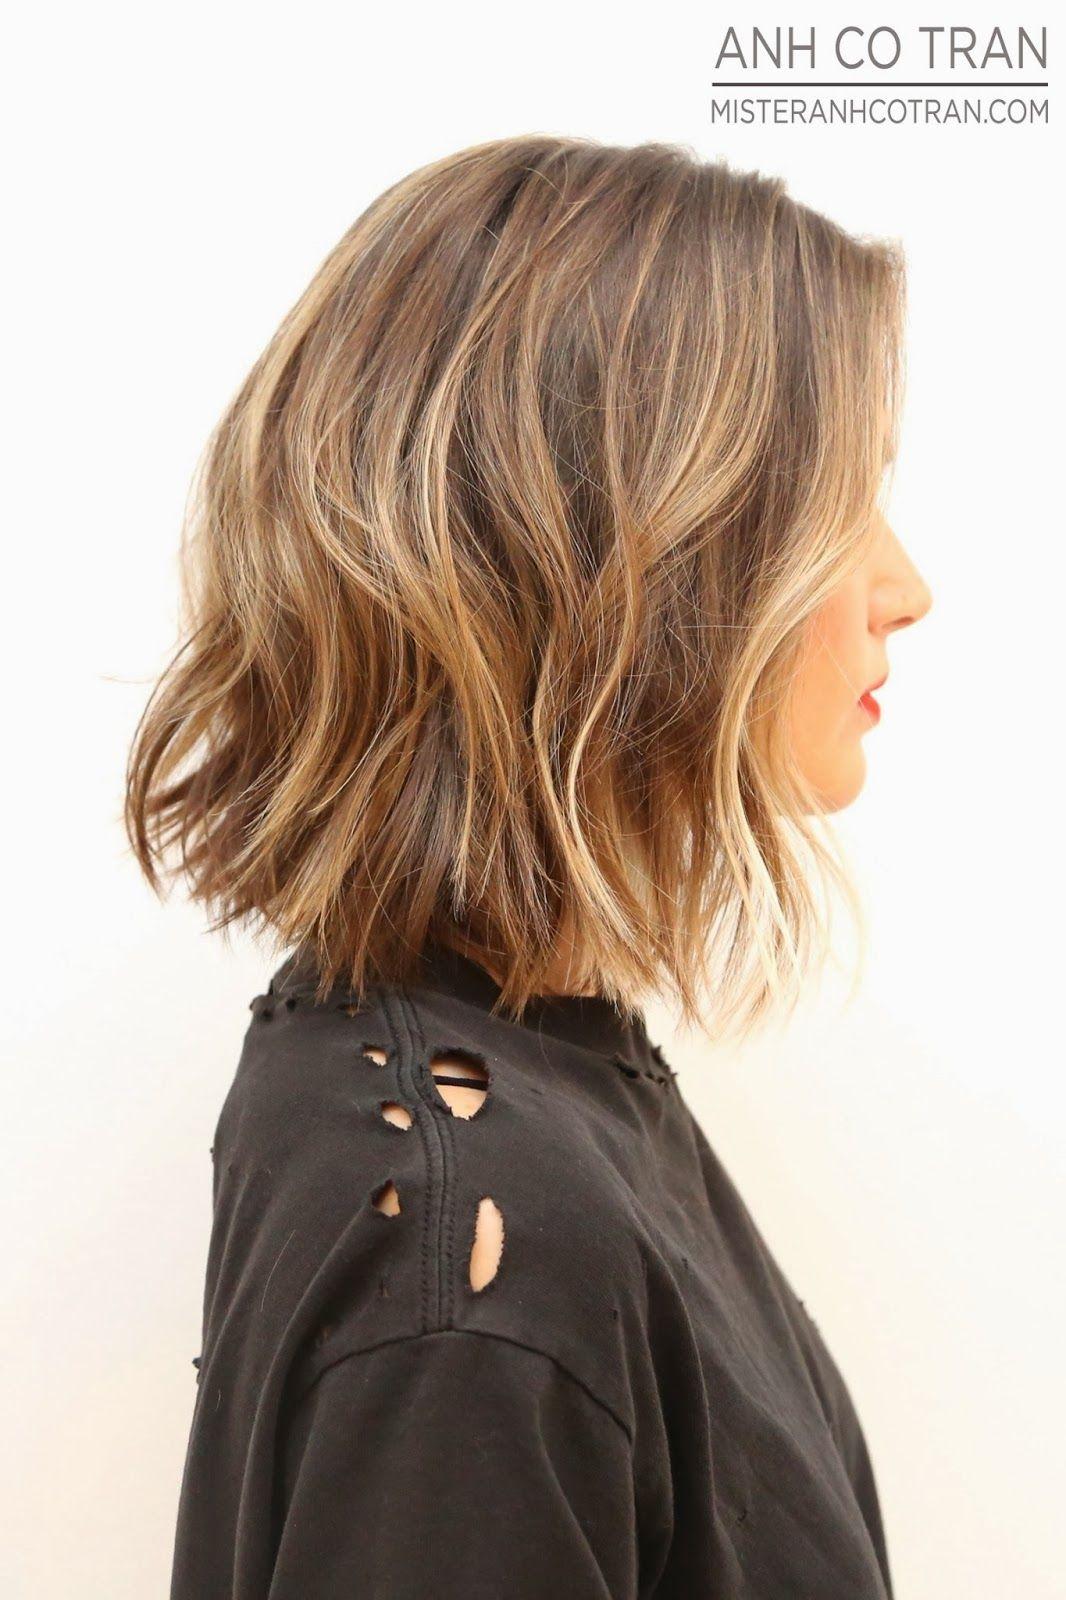 Shoulder length hair hair pinterest salons short cuts and